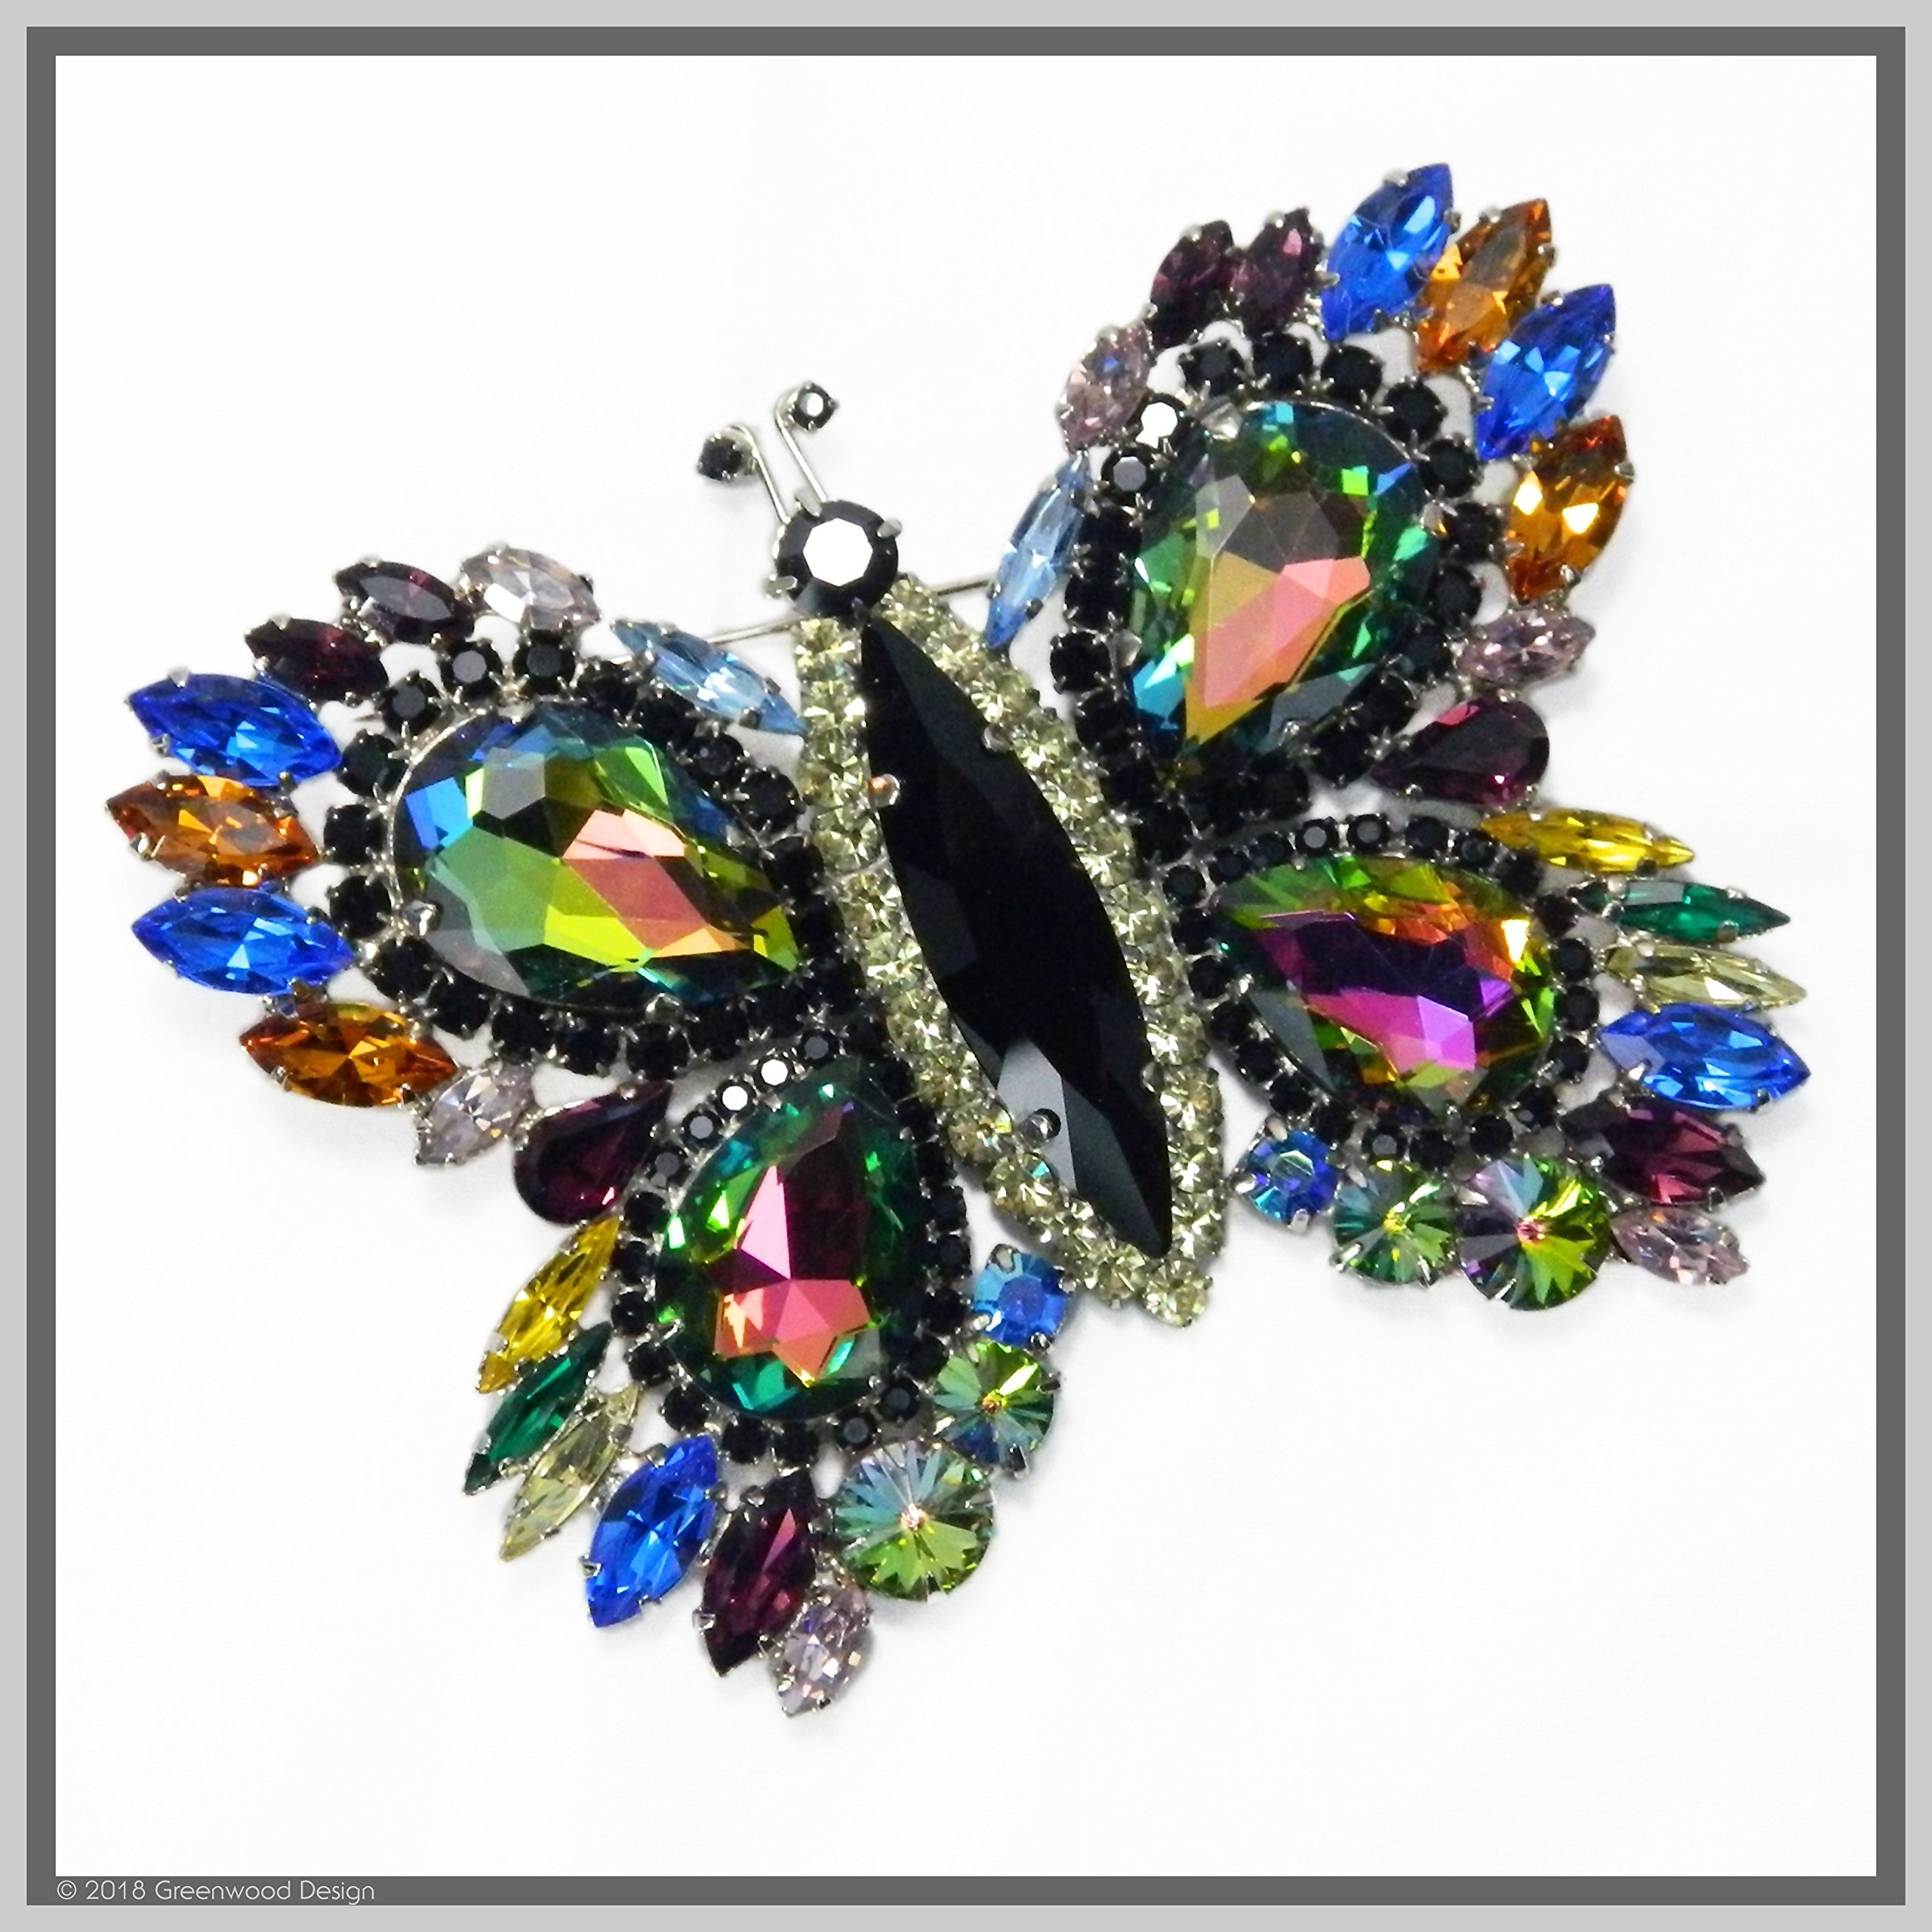 Vintage Inspired Jewelry Art Butterfly Brooch Pin Watermelon-Winged Swarovski Crystal Rhinestones